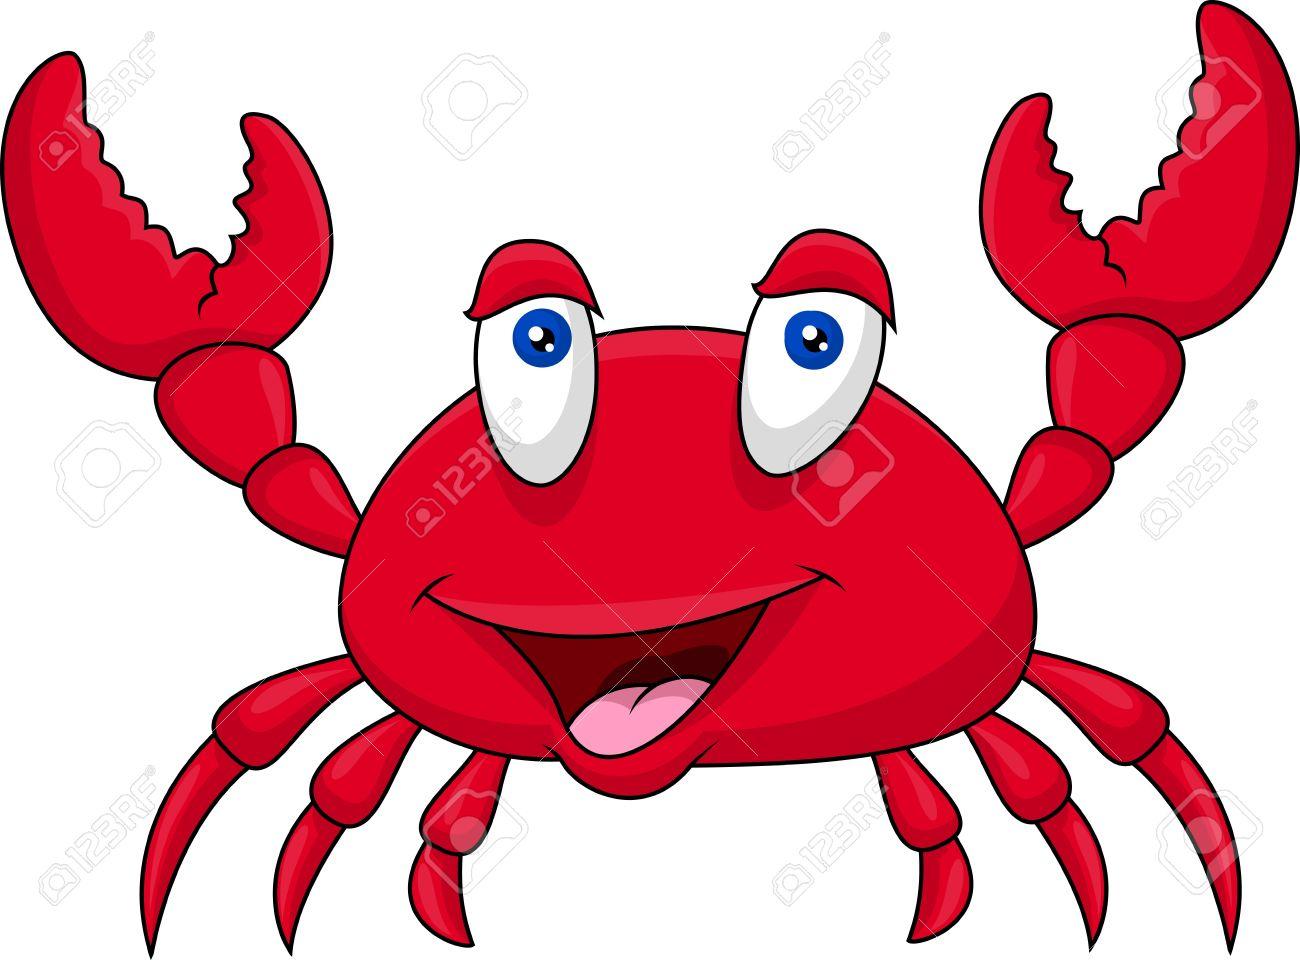 Crabwalk clipart royalty free download Crab Cartoon Images | Free download best Crab Cartoon Images on ... royalty free download